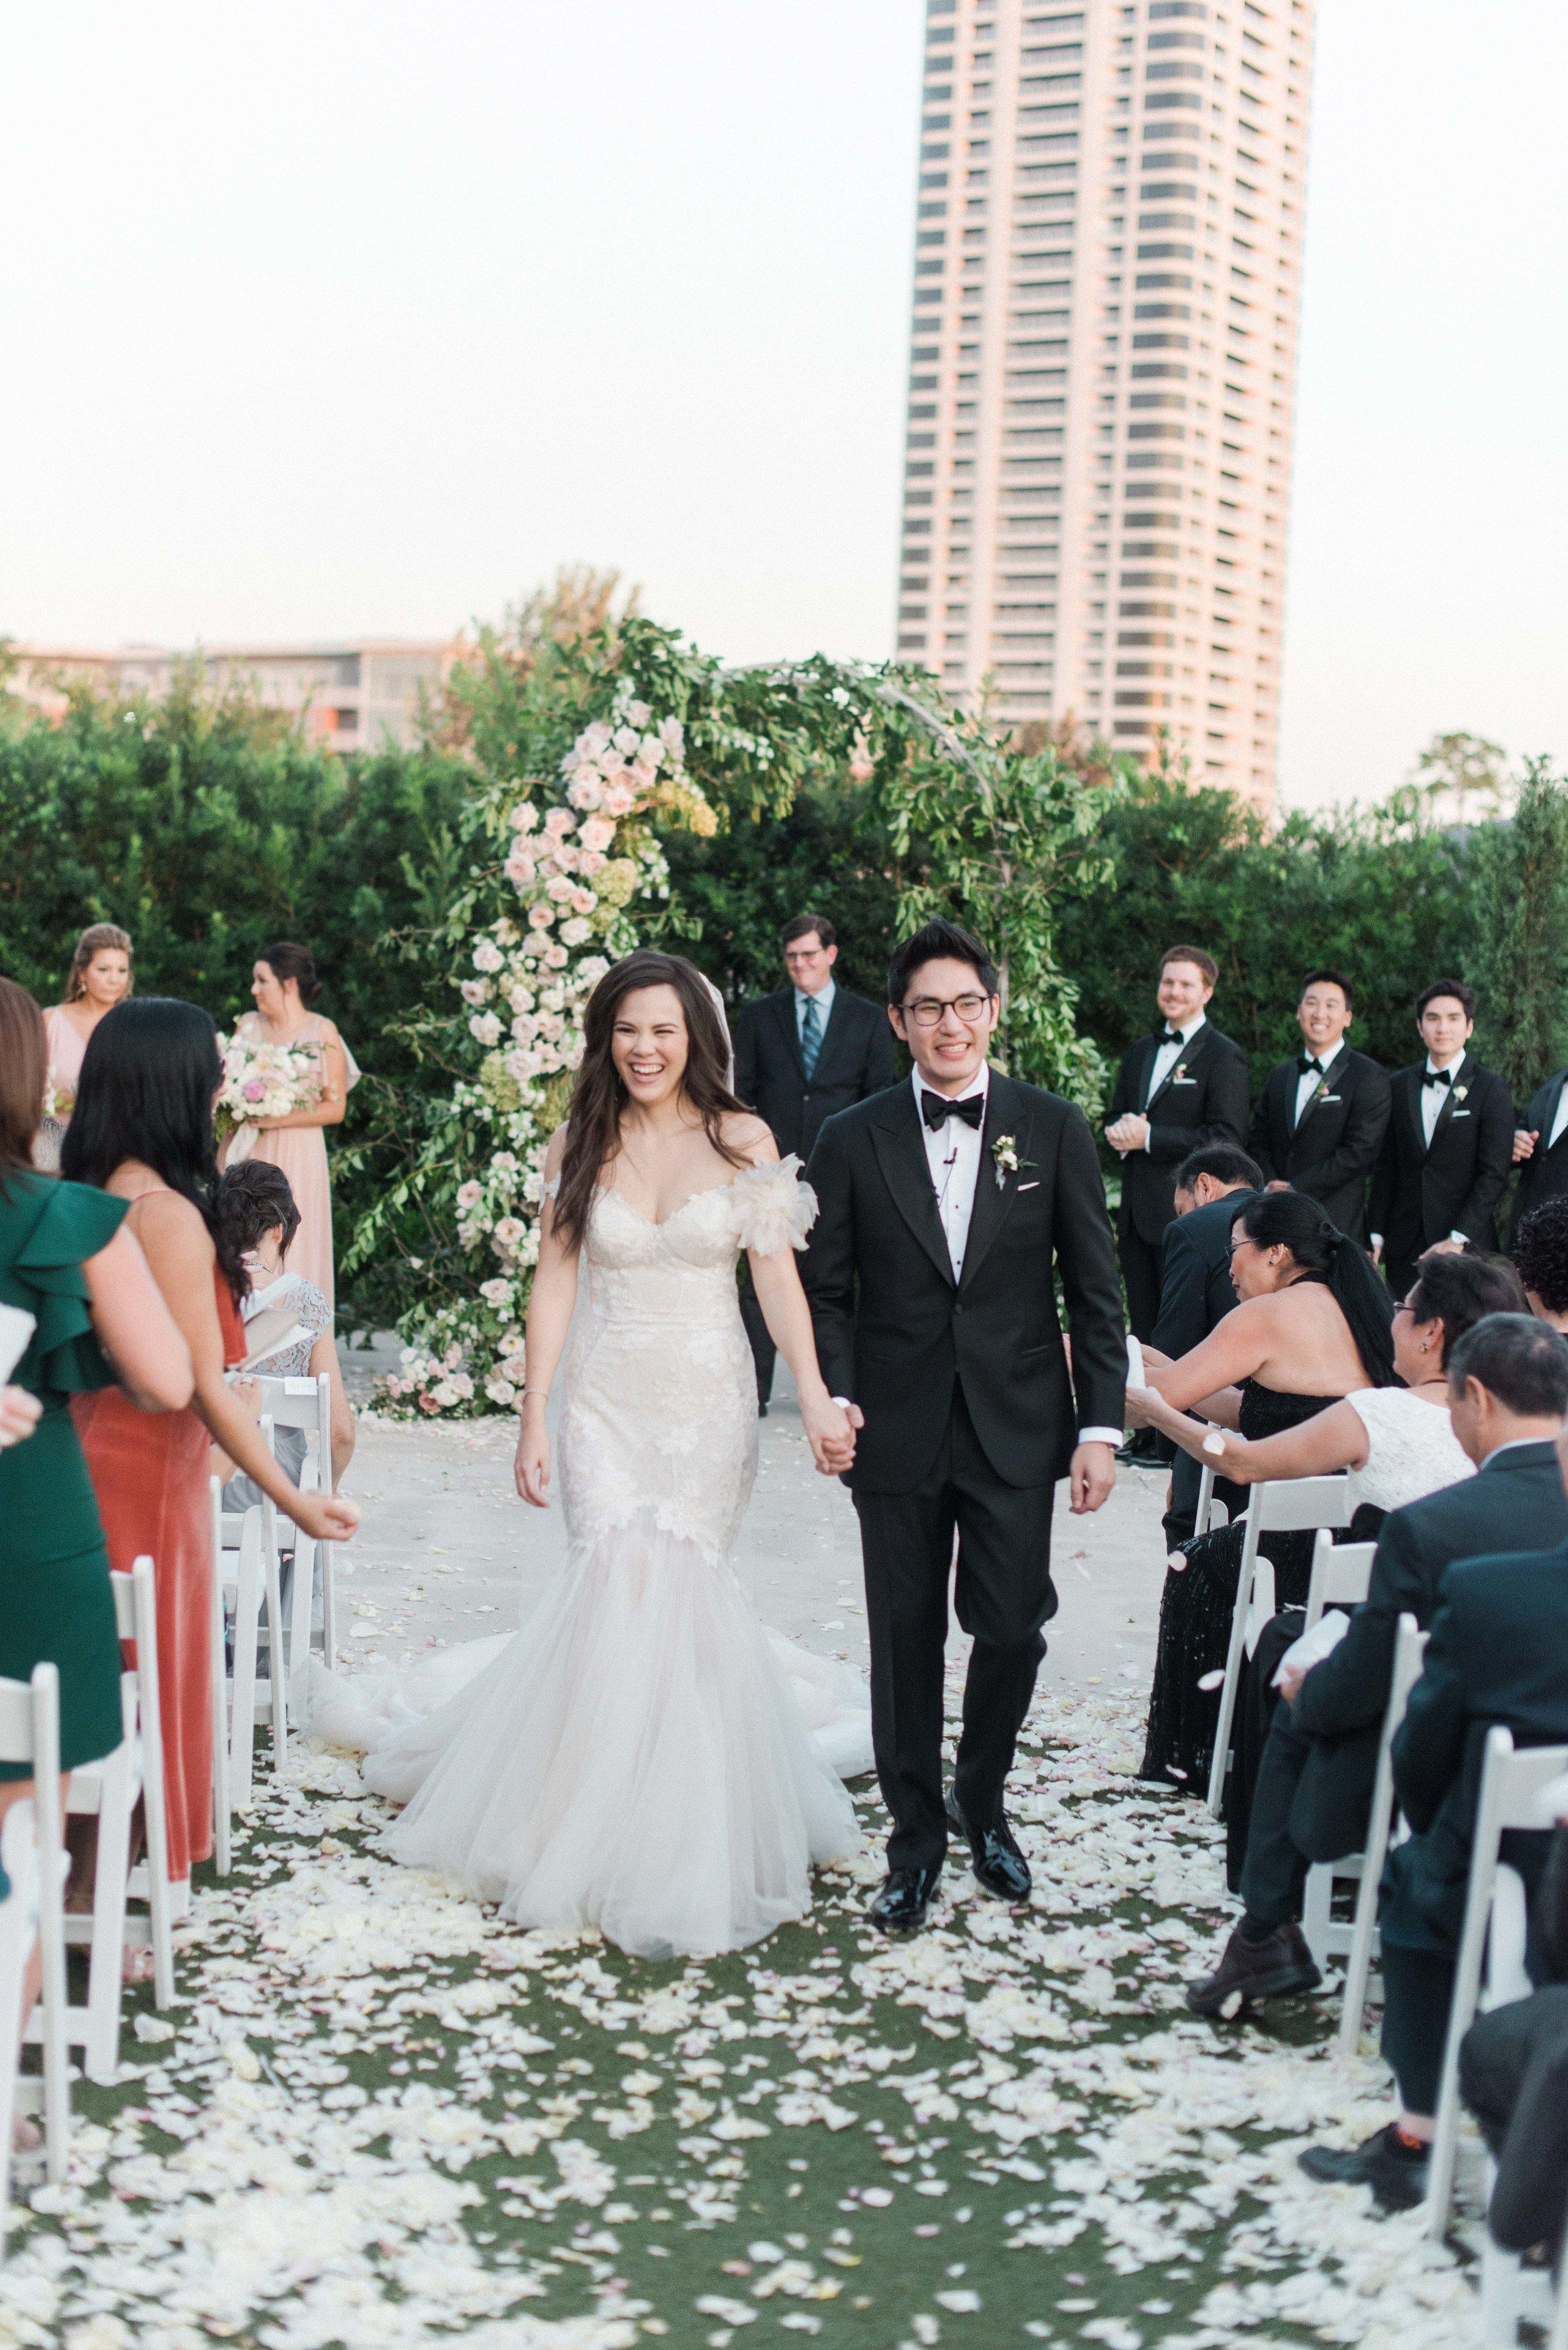 Martha-Stewart-Wedding-Dana-Fernandez-Photography-Josh-Texas-Film-Houston-Wedding-Fine-Art-Photographer-McGovern-Centennial-Gardens-Top-Best-131.jpg